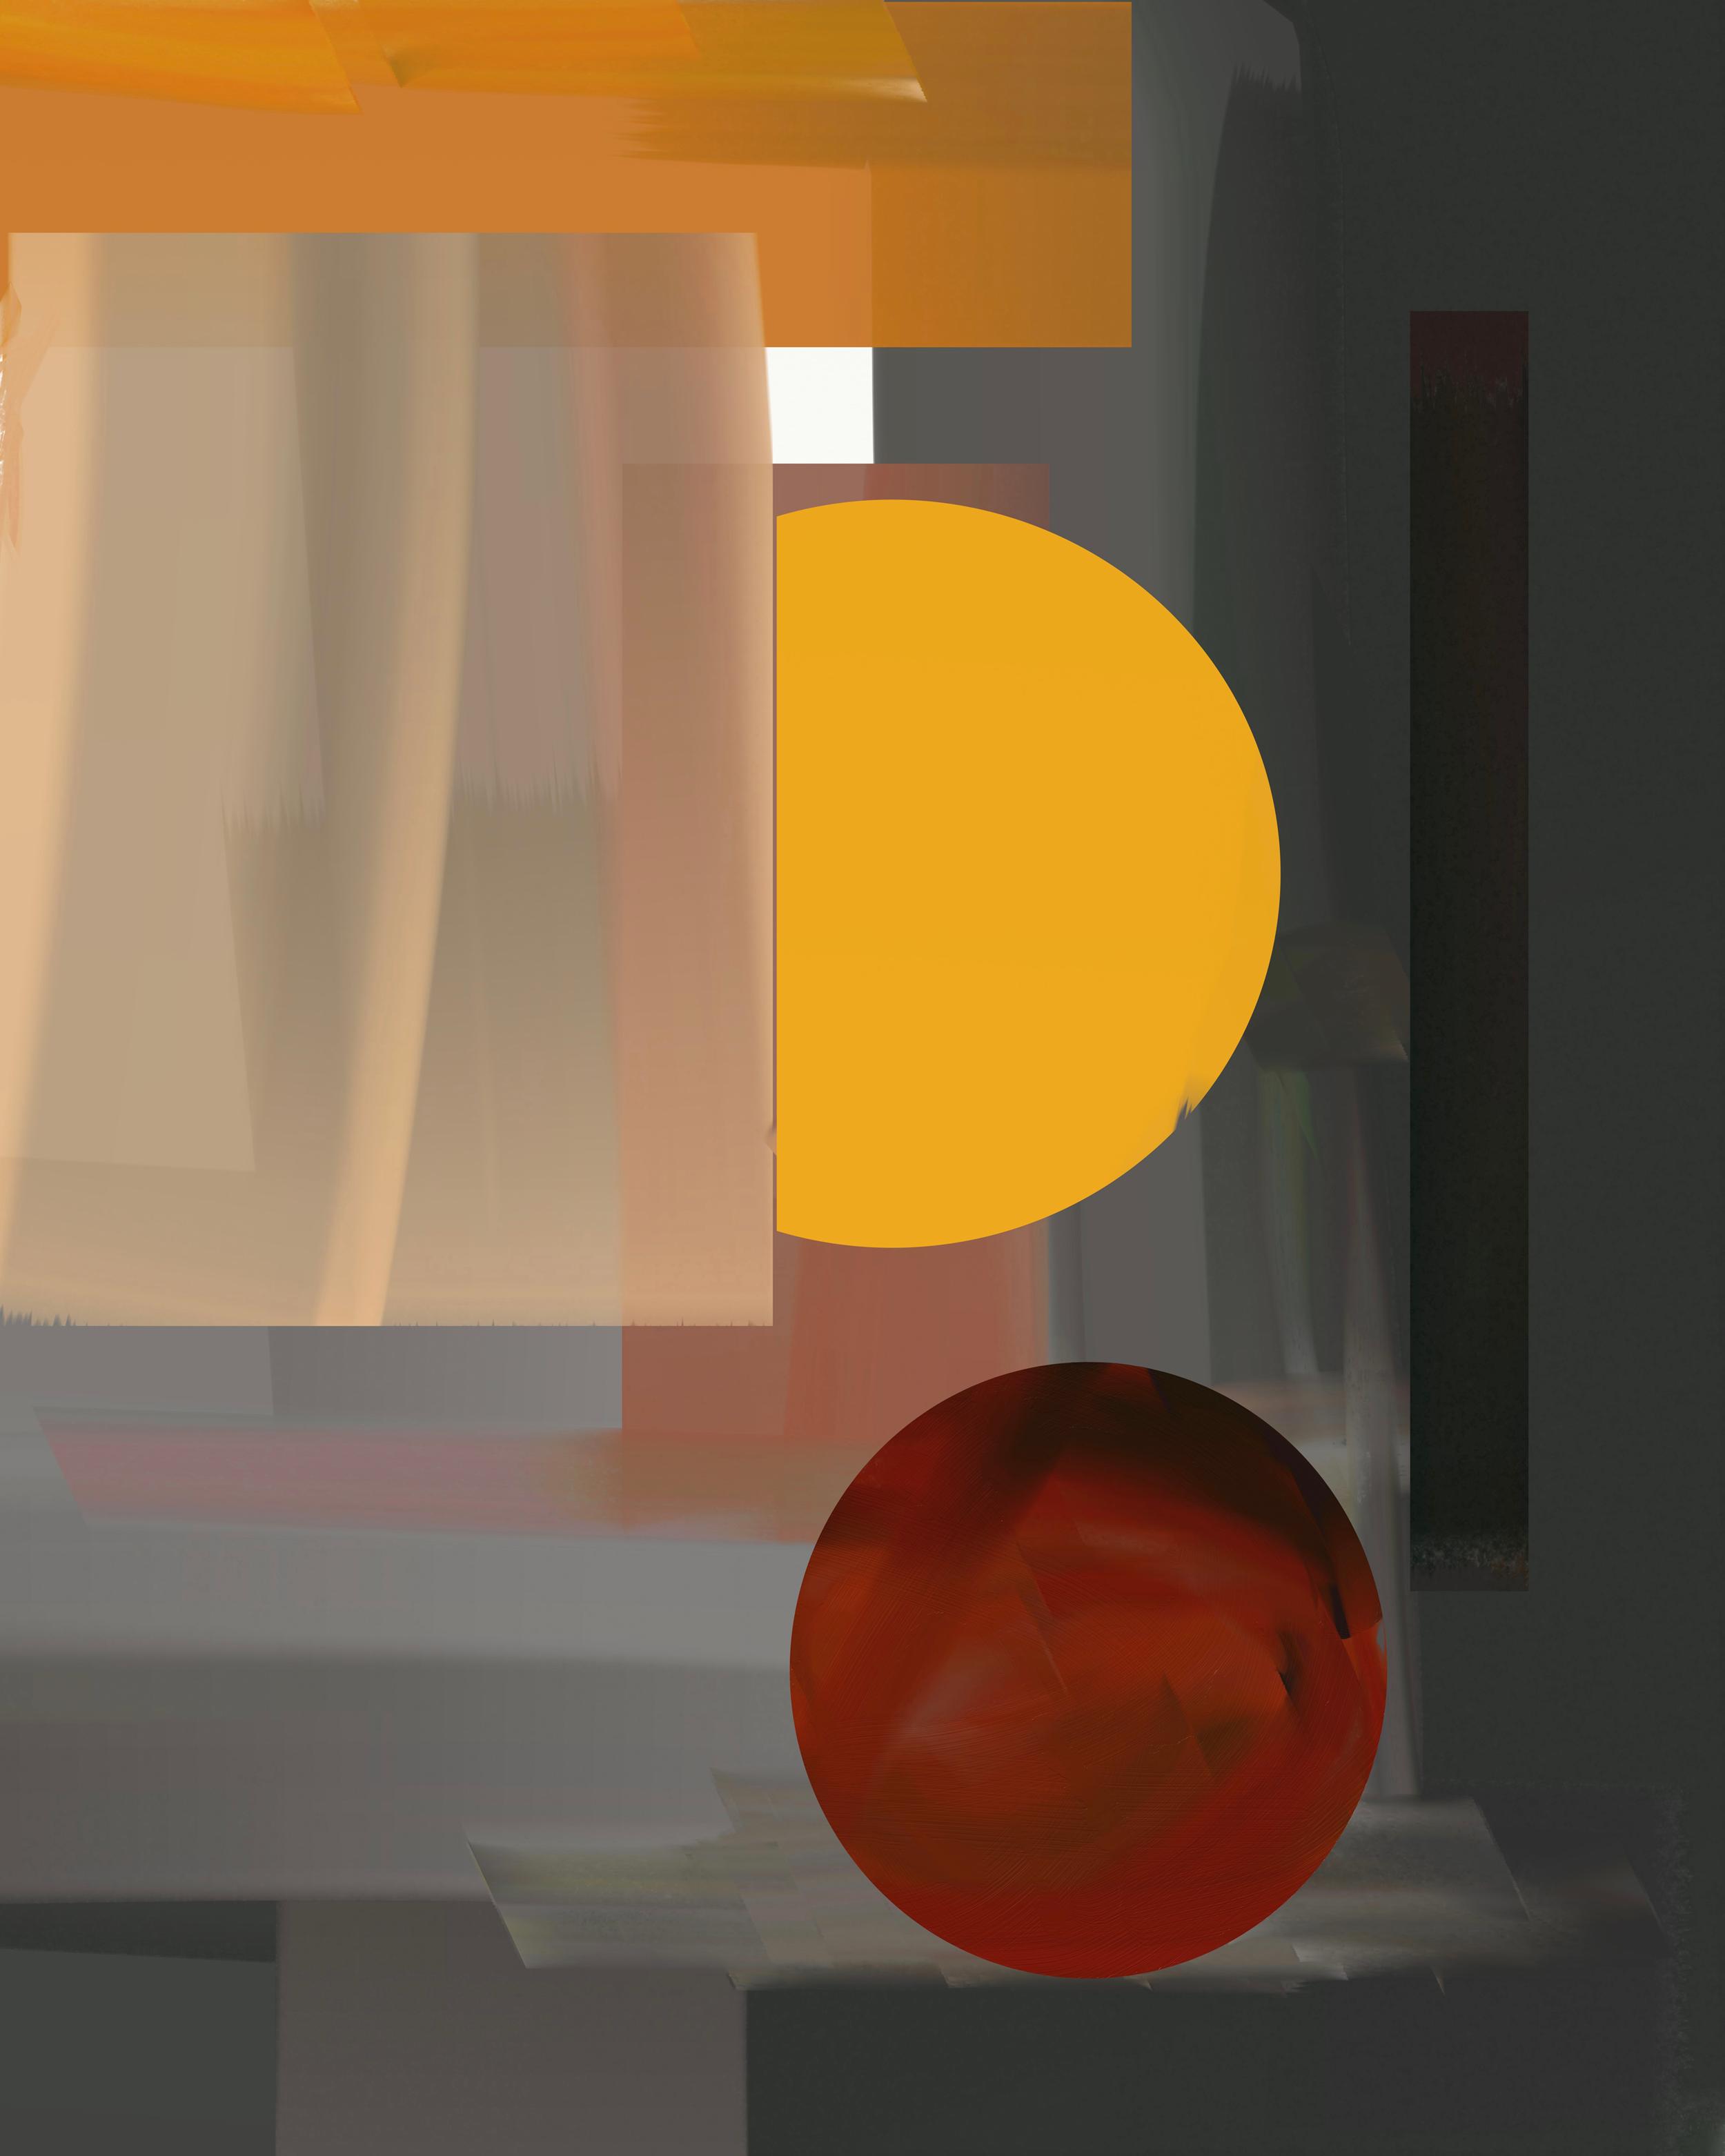 Digital Abstract Series - No. I (2019) iPad creation